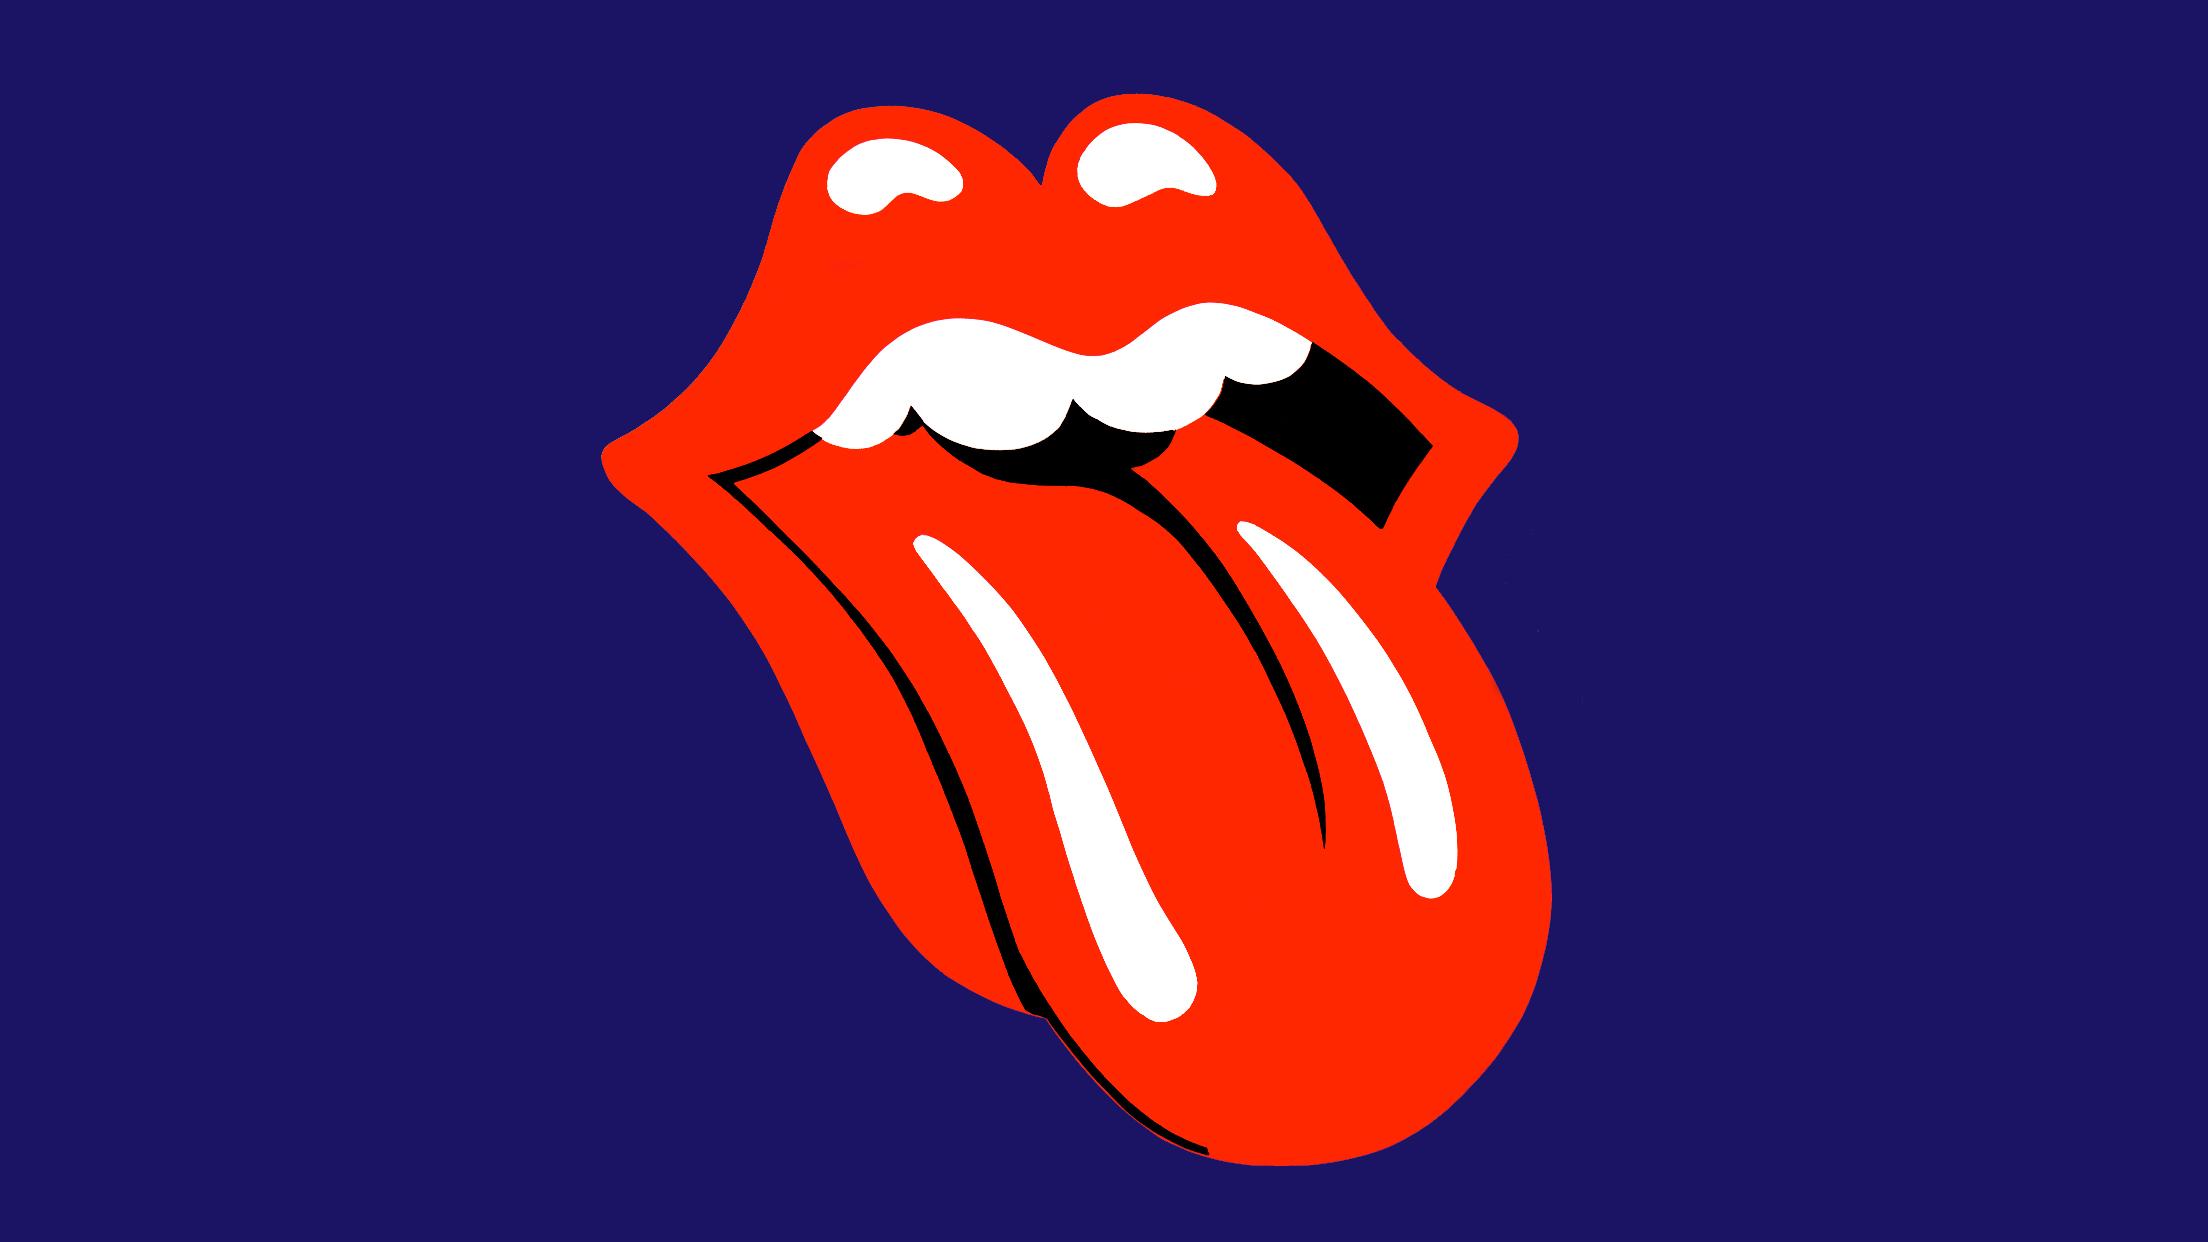 Rolling Stones Tongue Rainbow Free Wallpaper Logo Pop Art Iphone